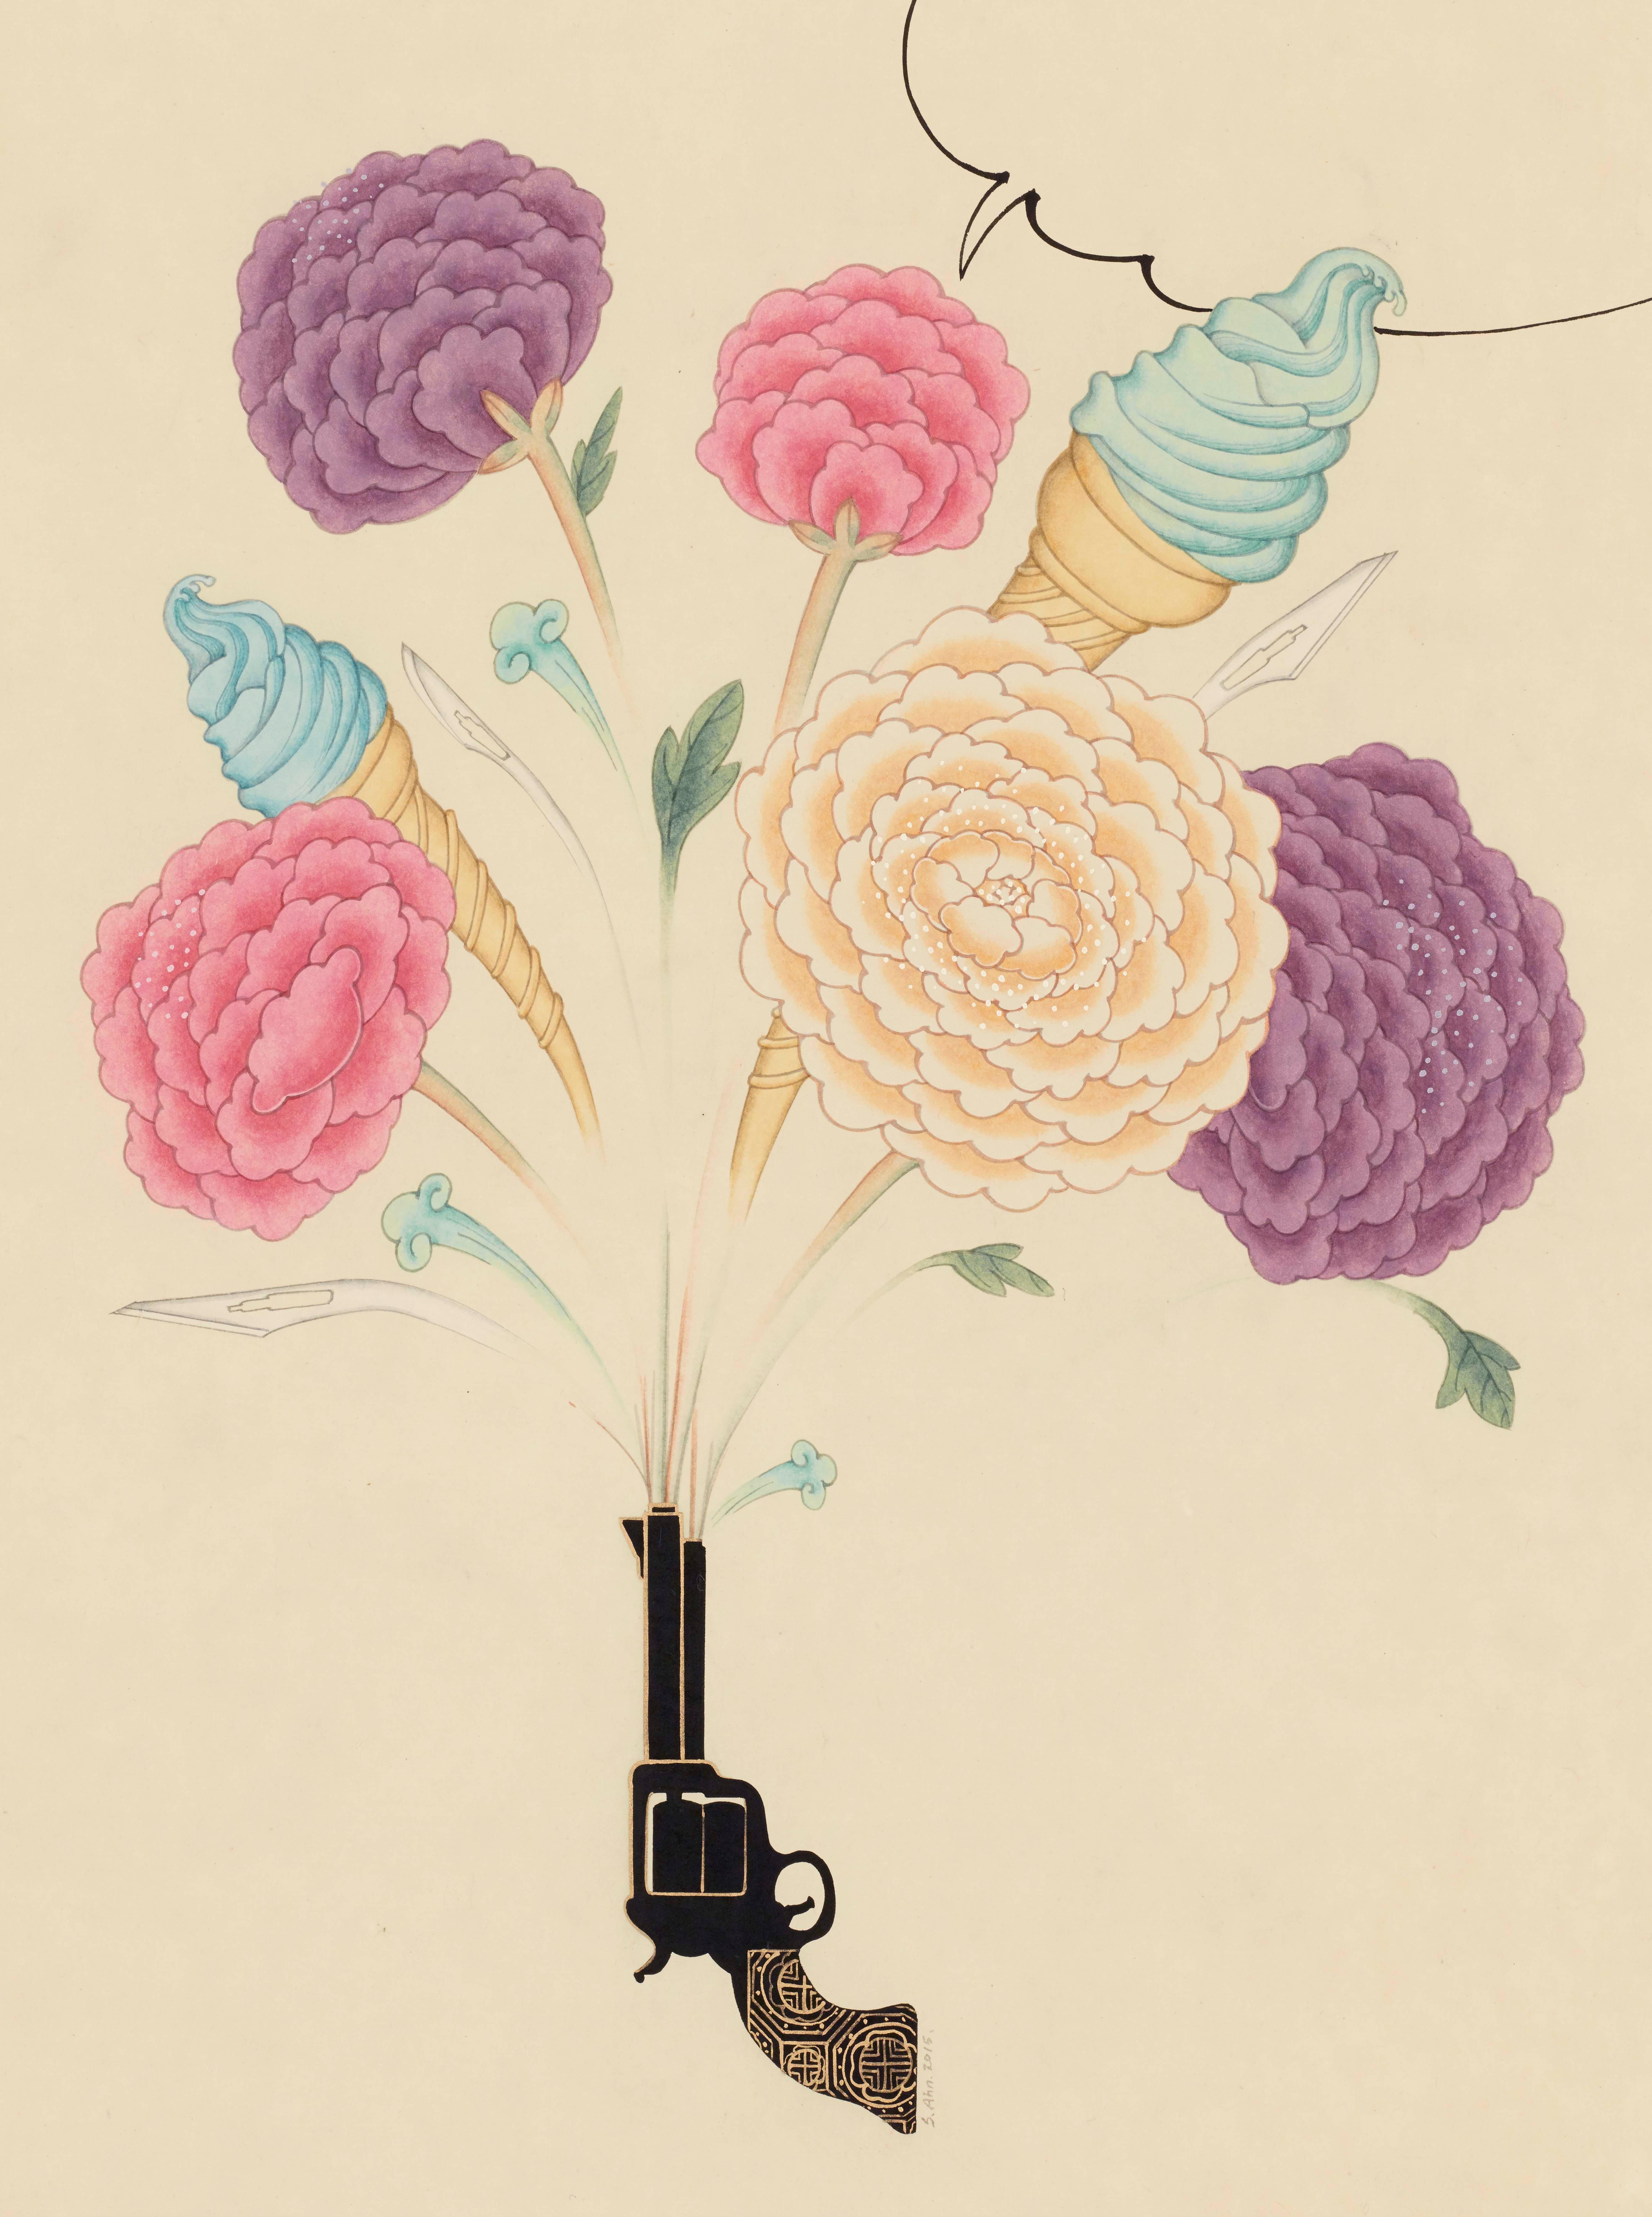 Inter-Relation Selfie 207, representational work on paper, gun with flowers